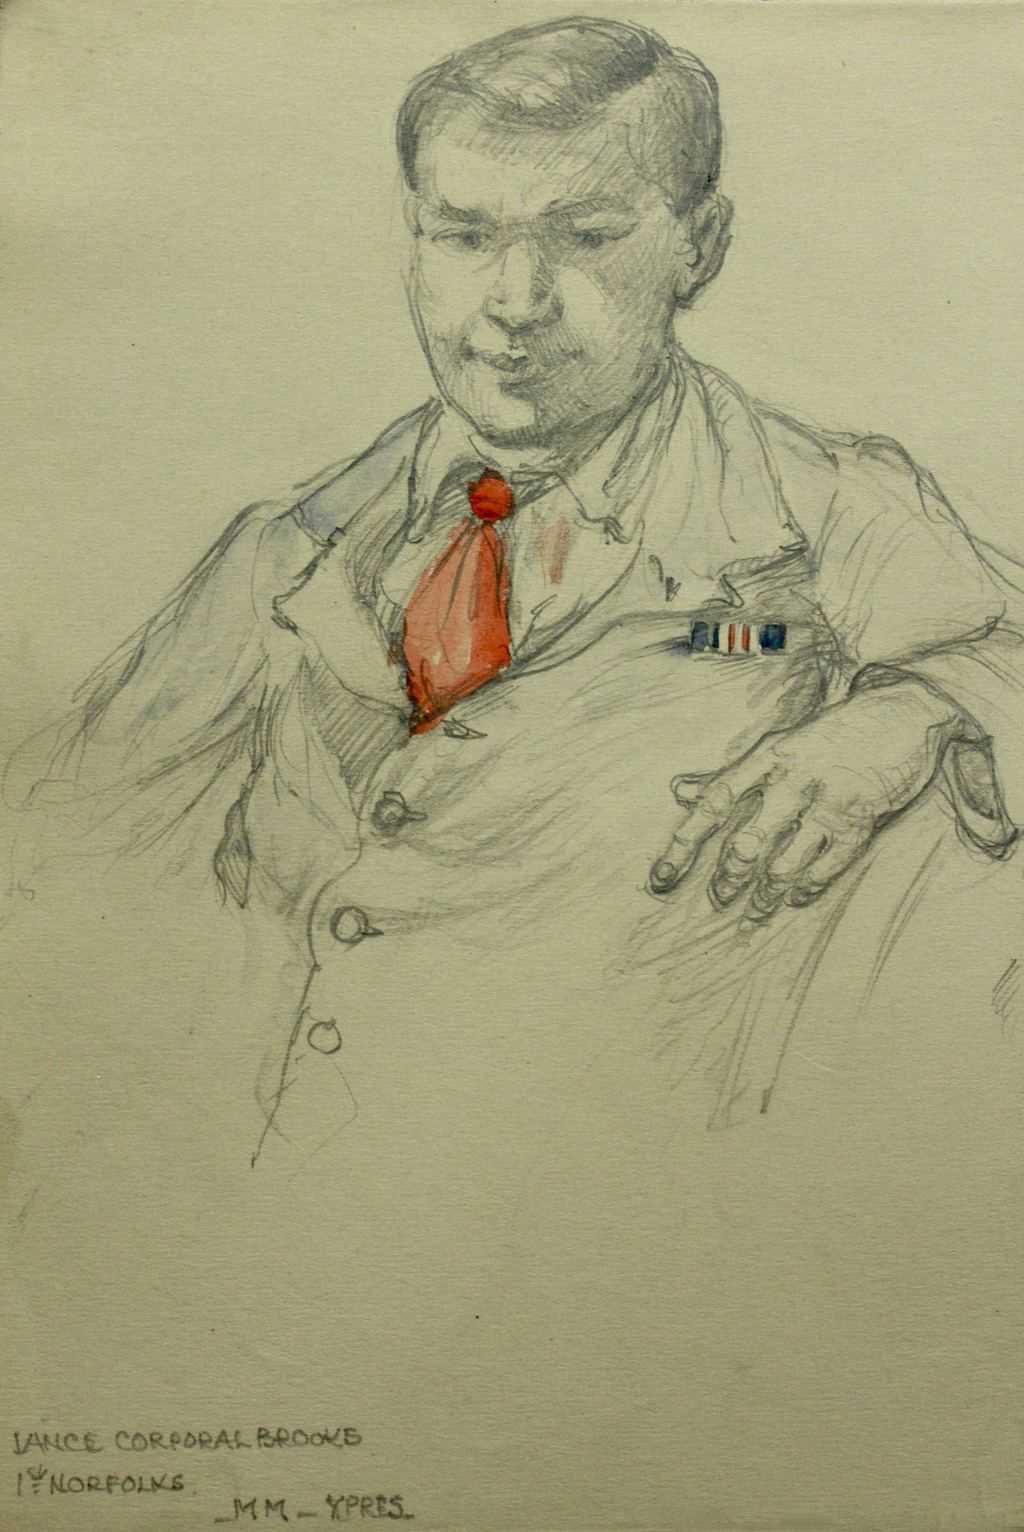 Sketch of Lance Corporqal BROOKS 1st Norfolks / MM Ypres